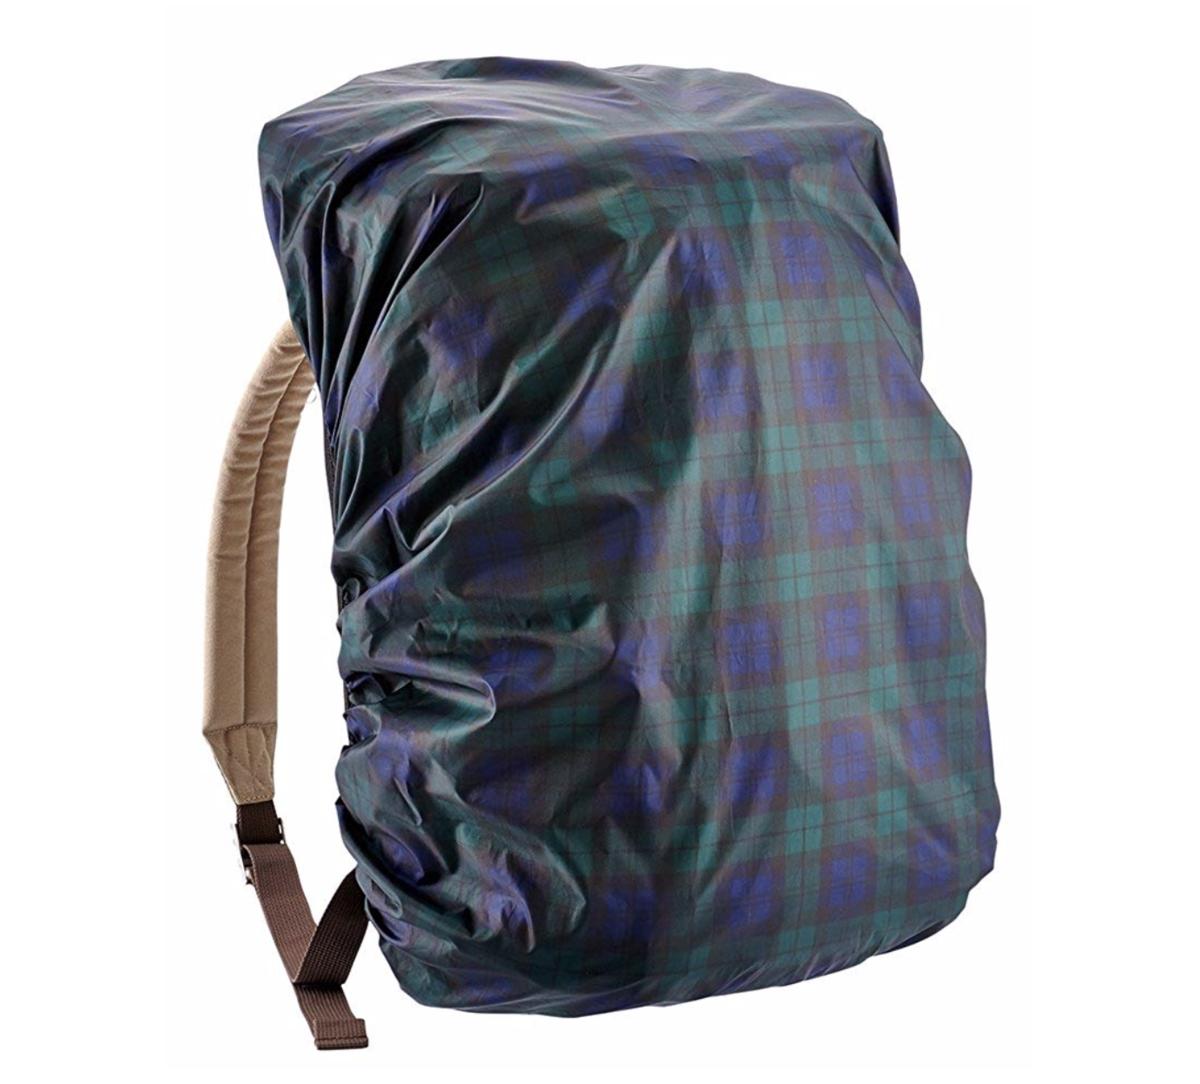 f:id:thebackpack:20190416181636p:plain